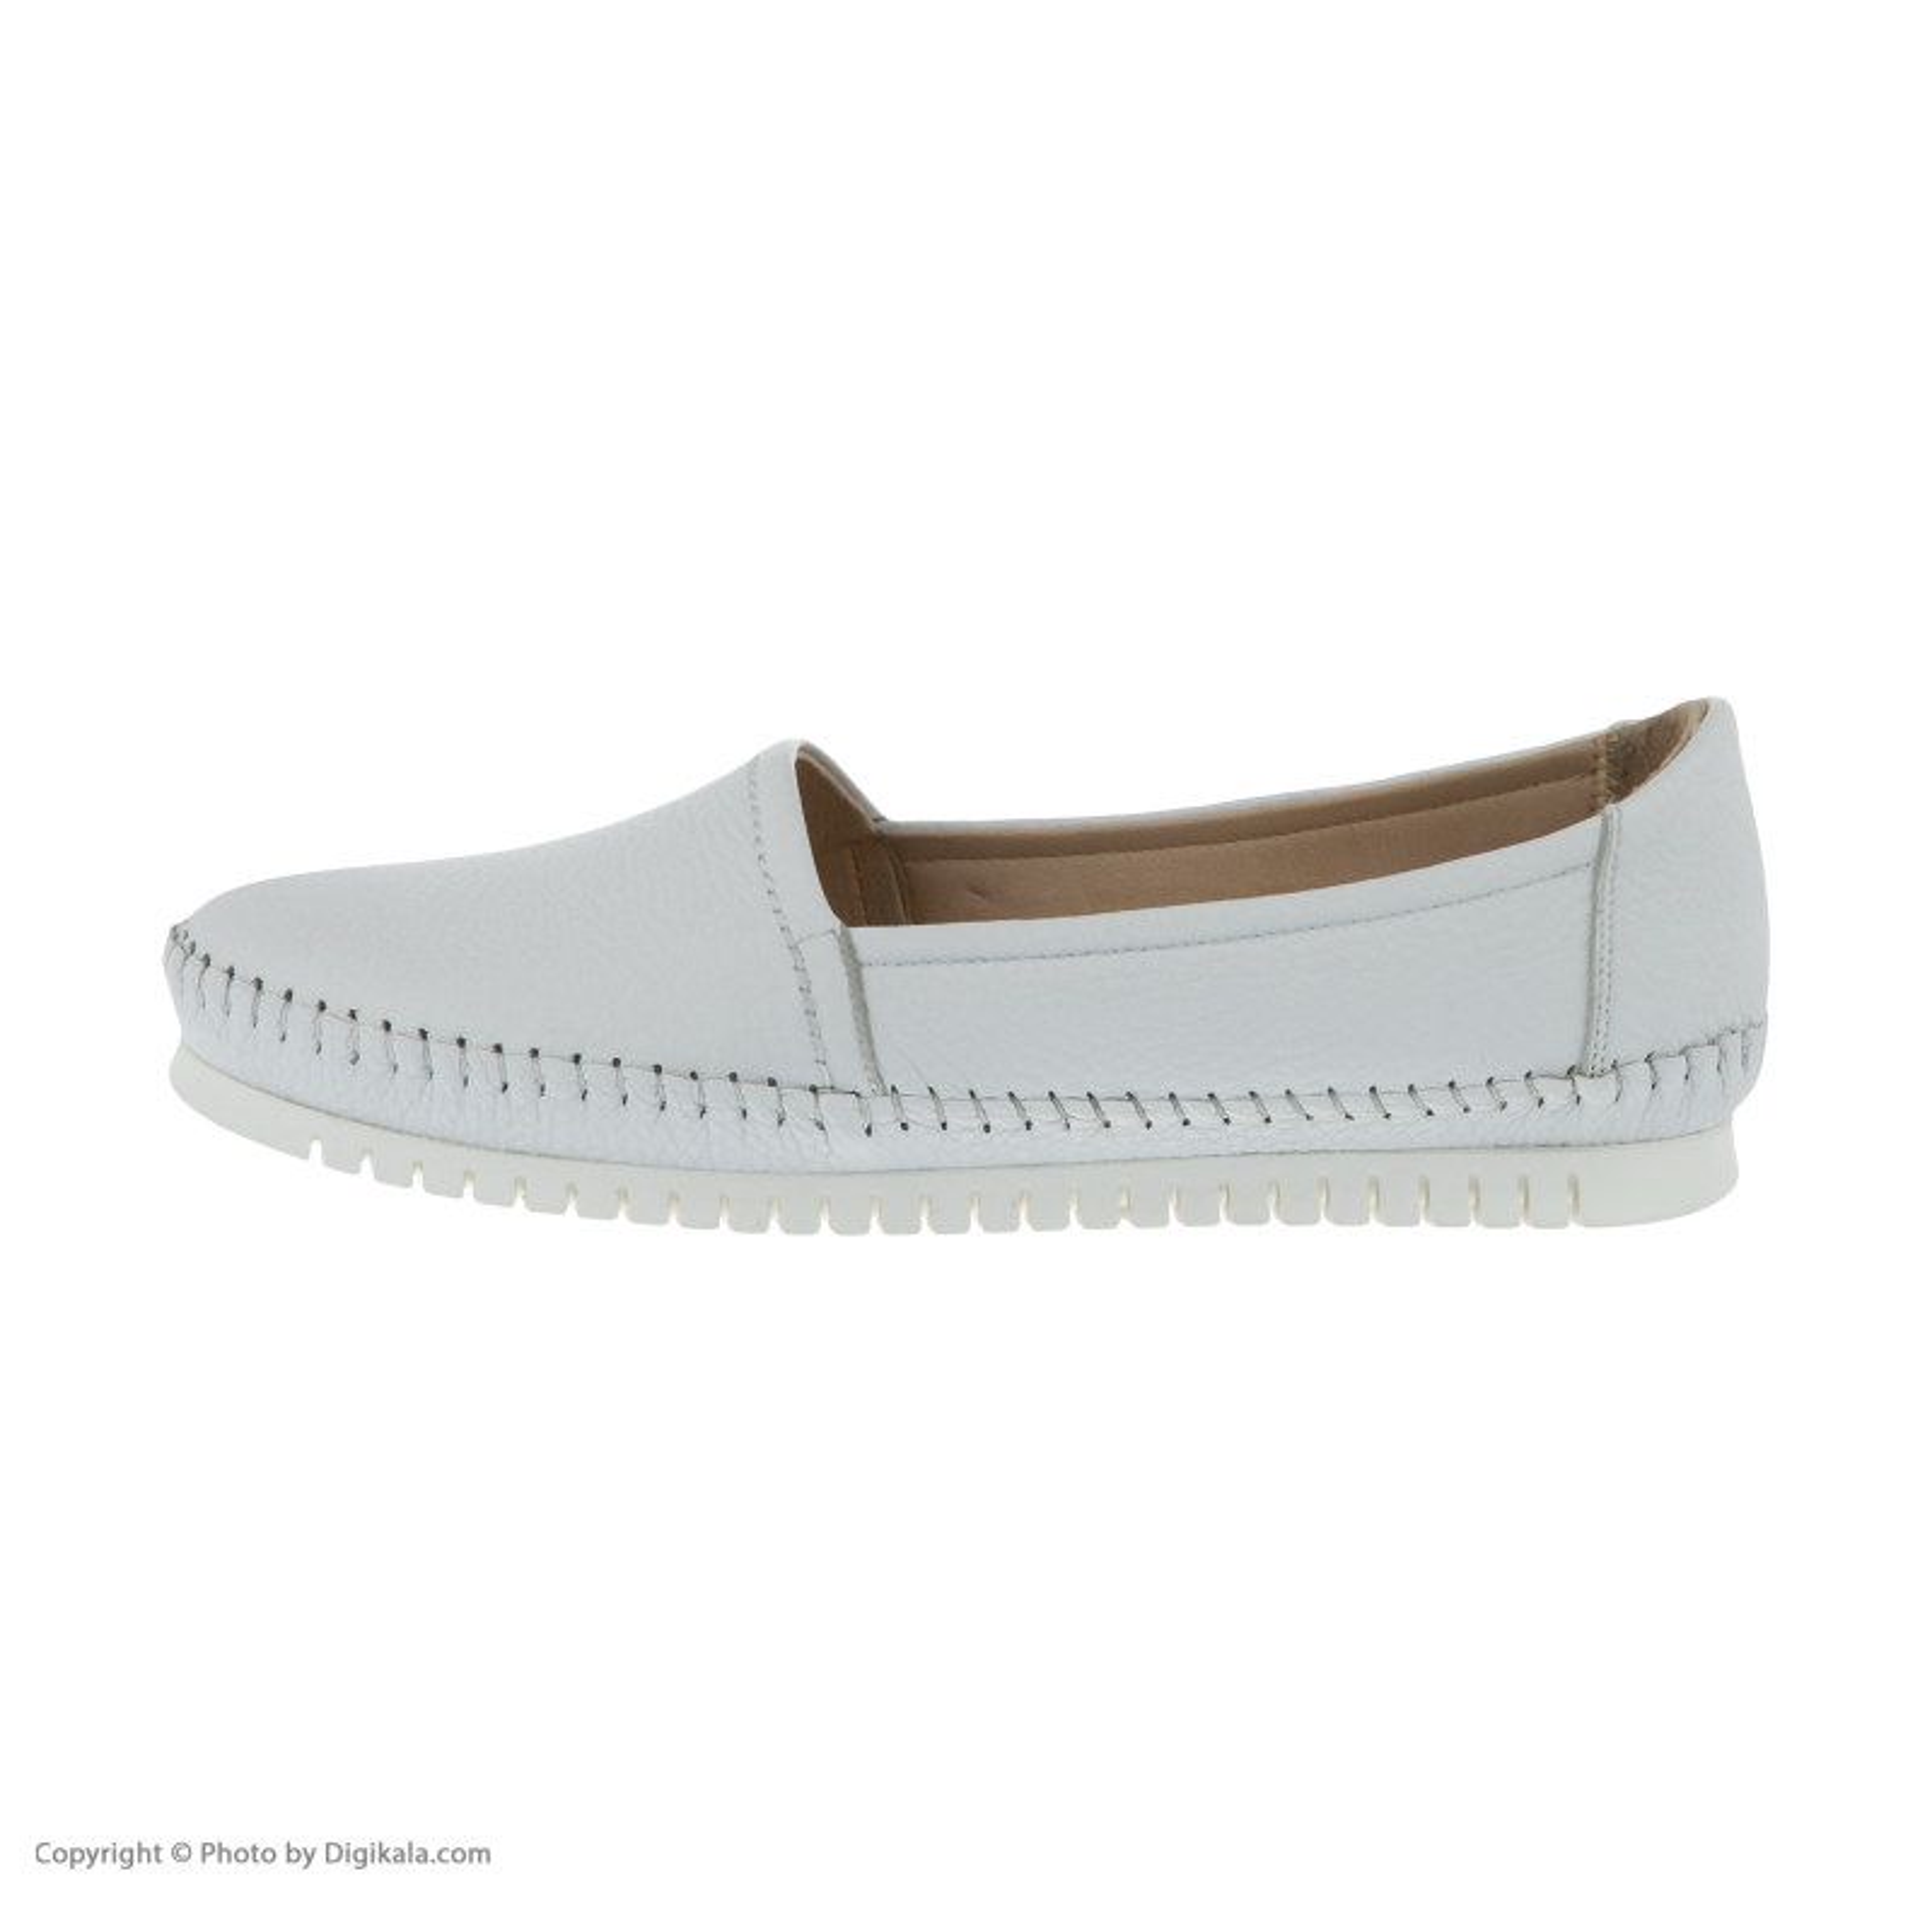 کفش روزمره زنانه برتونیکس مدل 240-B-44